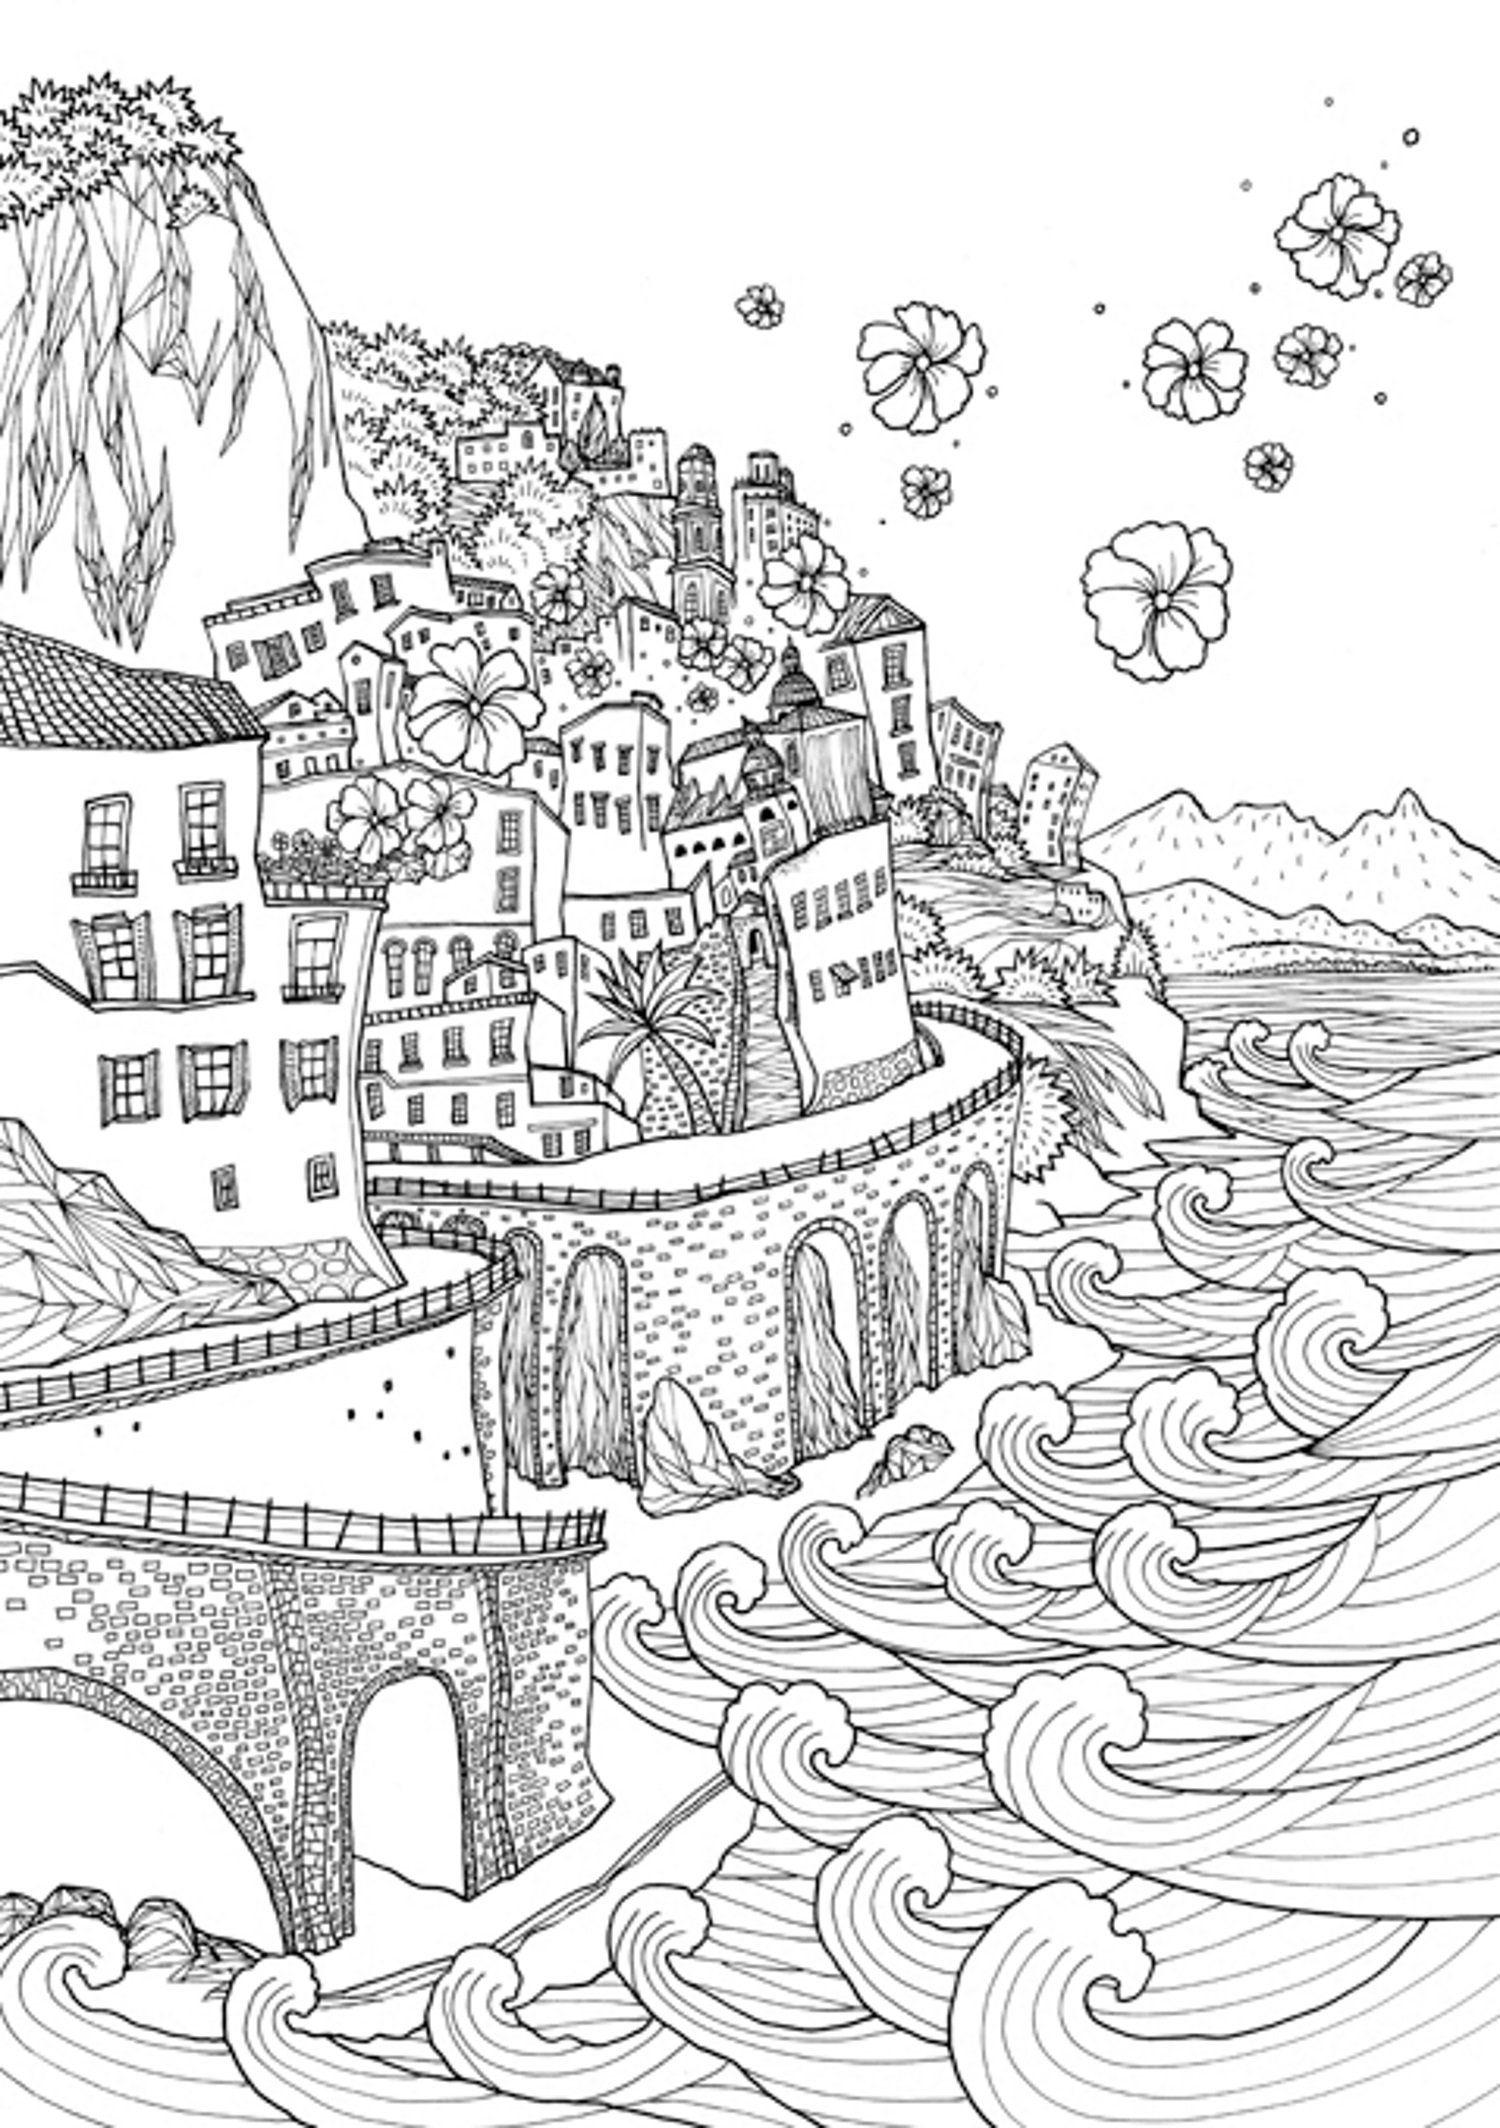 Coloring Europe Bella Italia A Coloring Book Tour Of The World Capital Of Romance Il Sun Lee